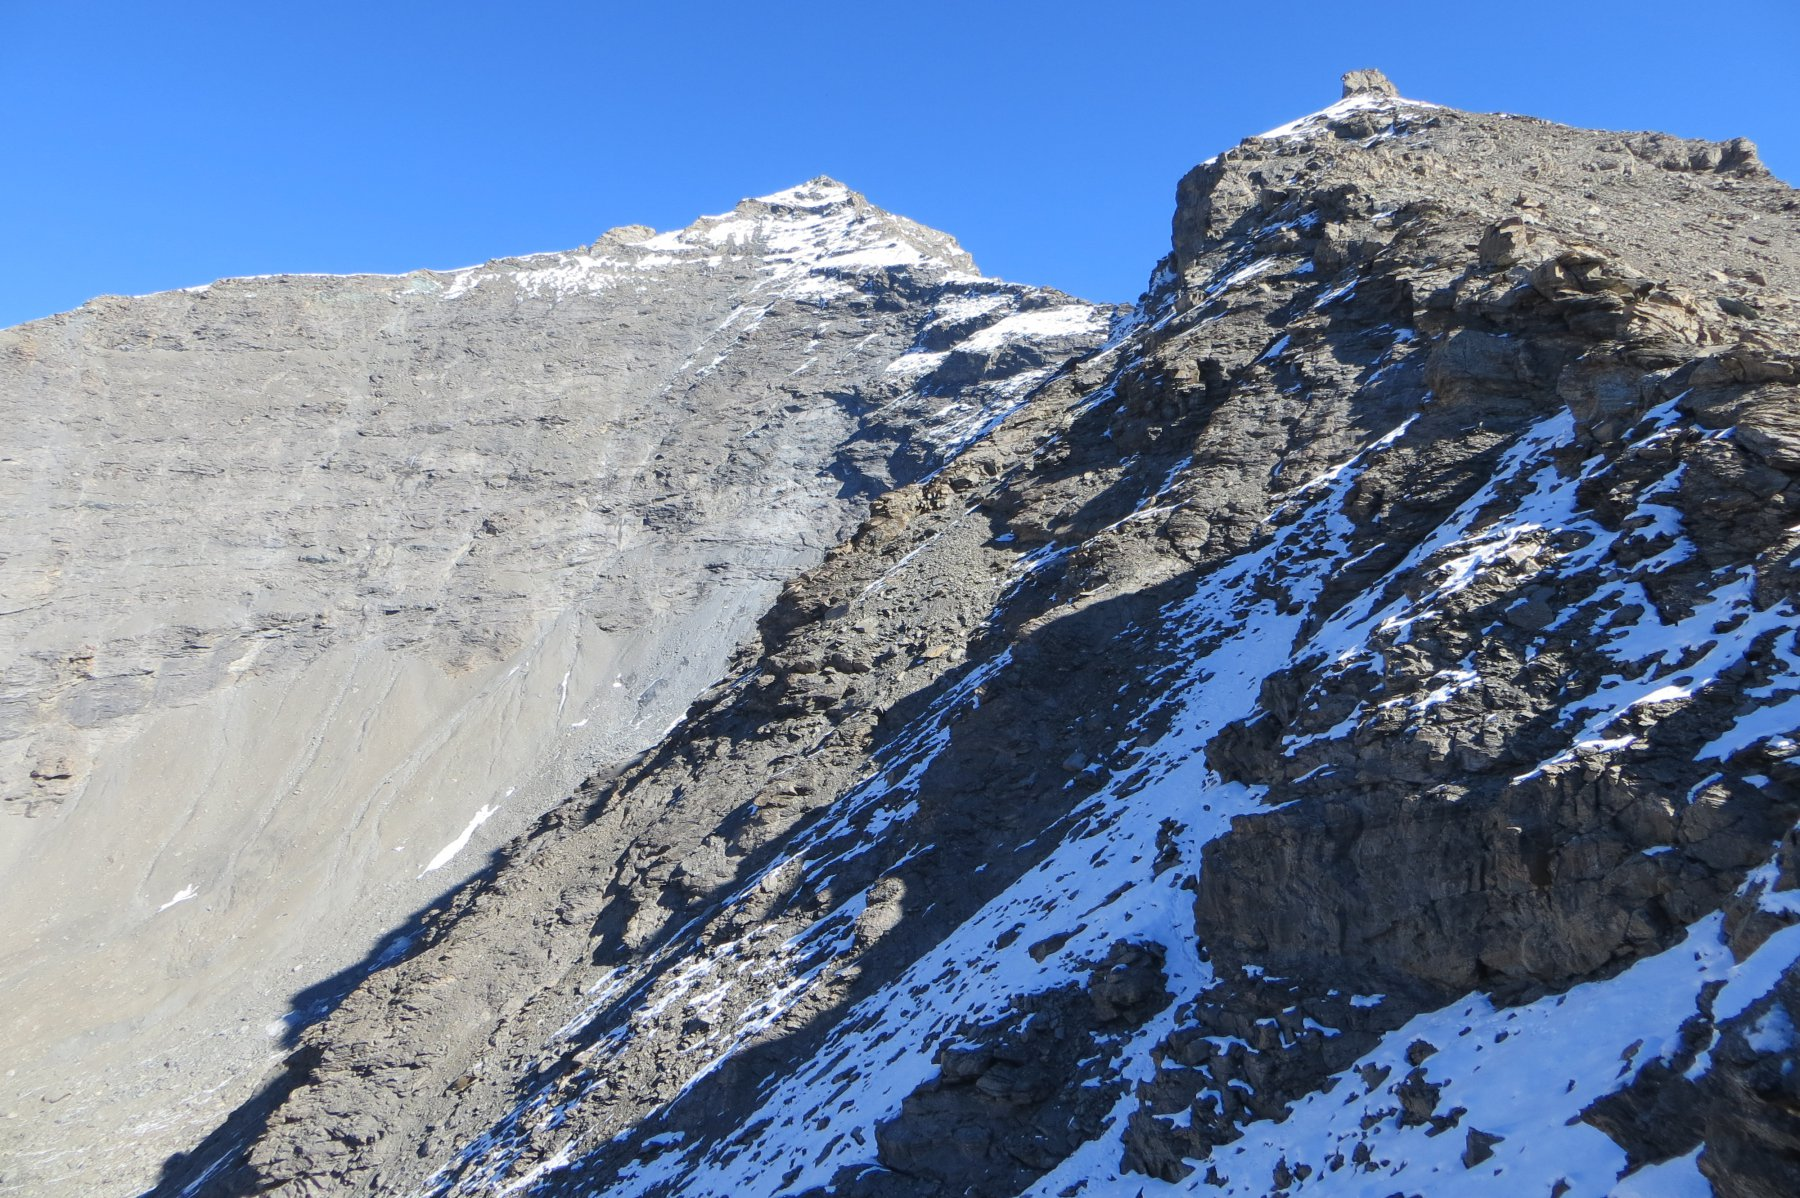 Charbonnel versante ovest a sinistra, Fond d'Orset a destra